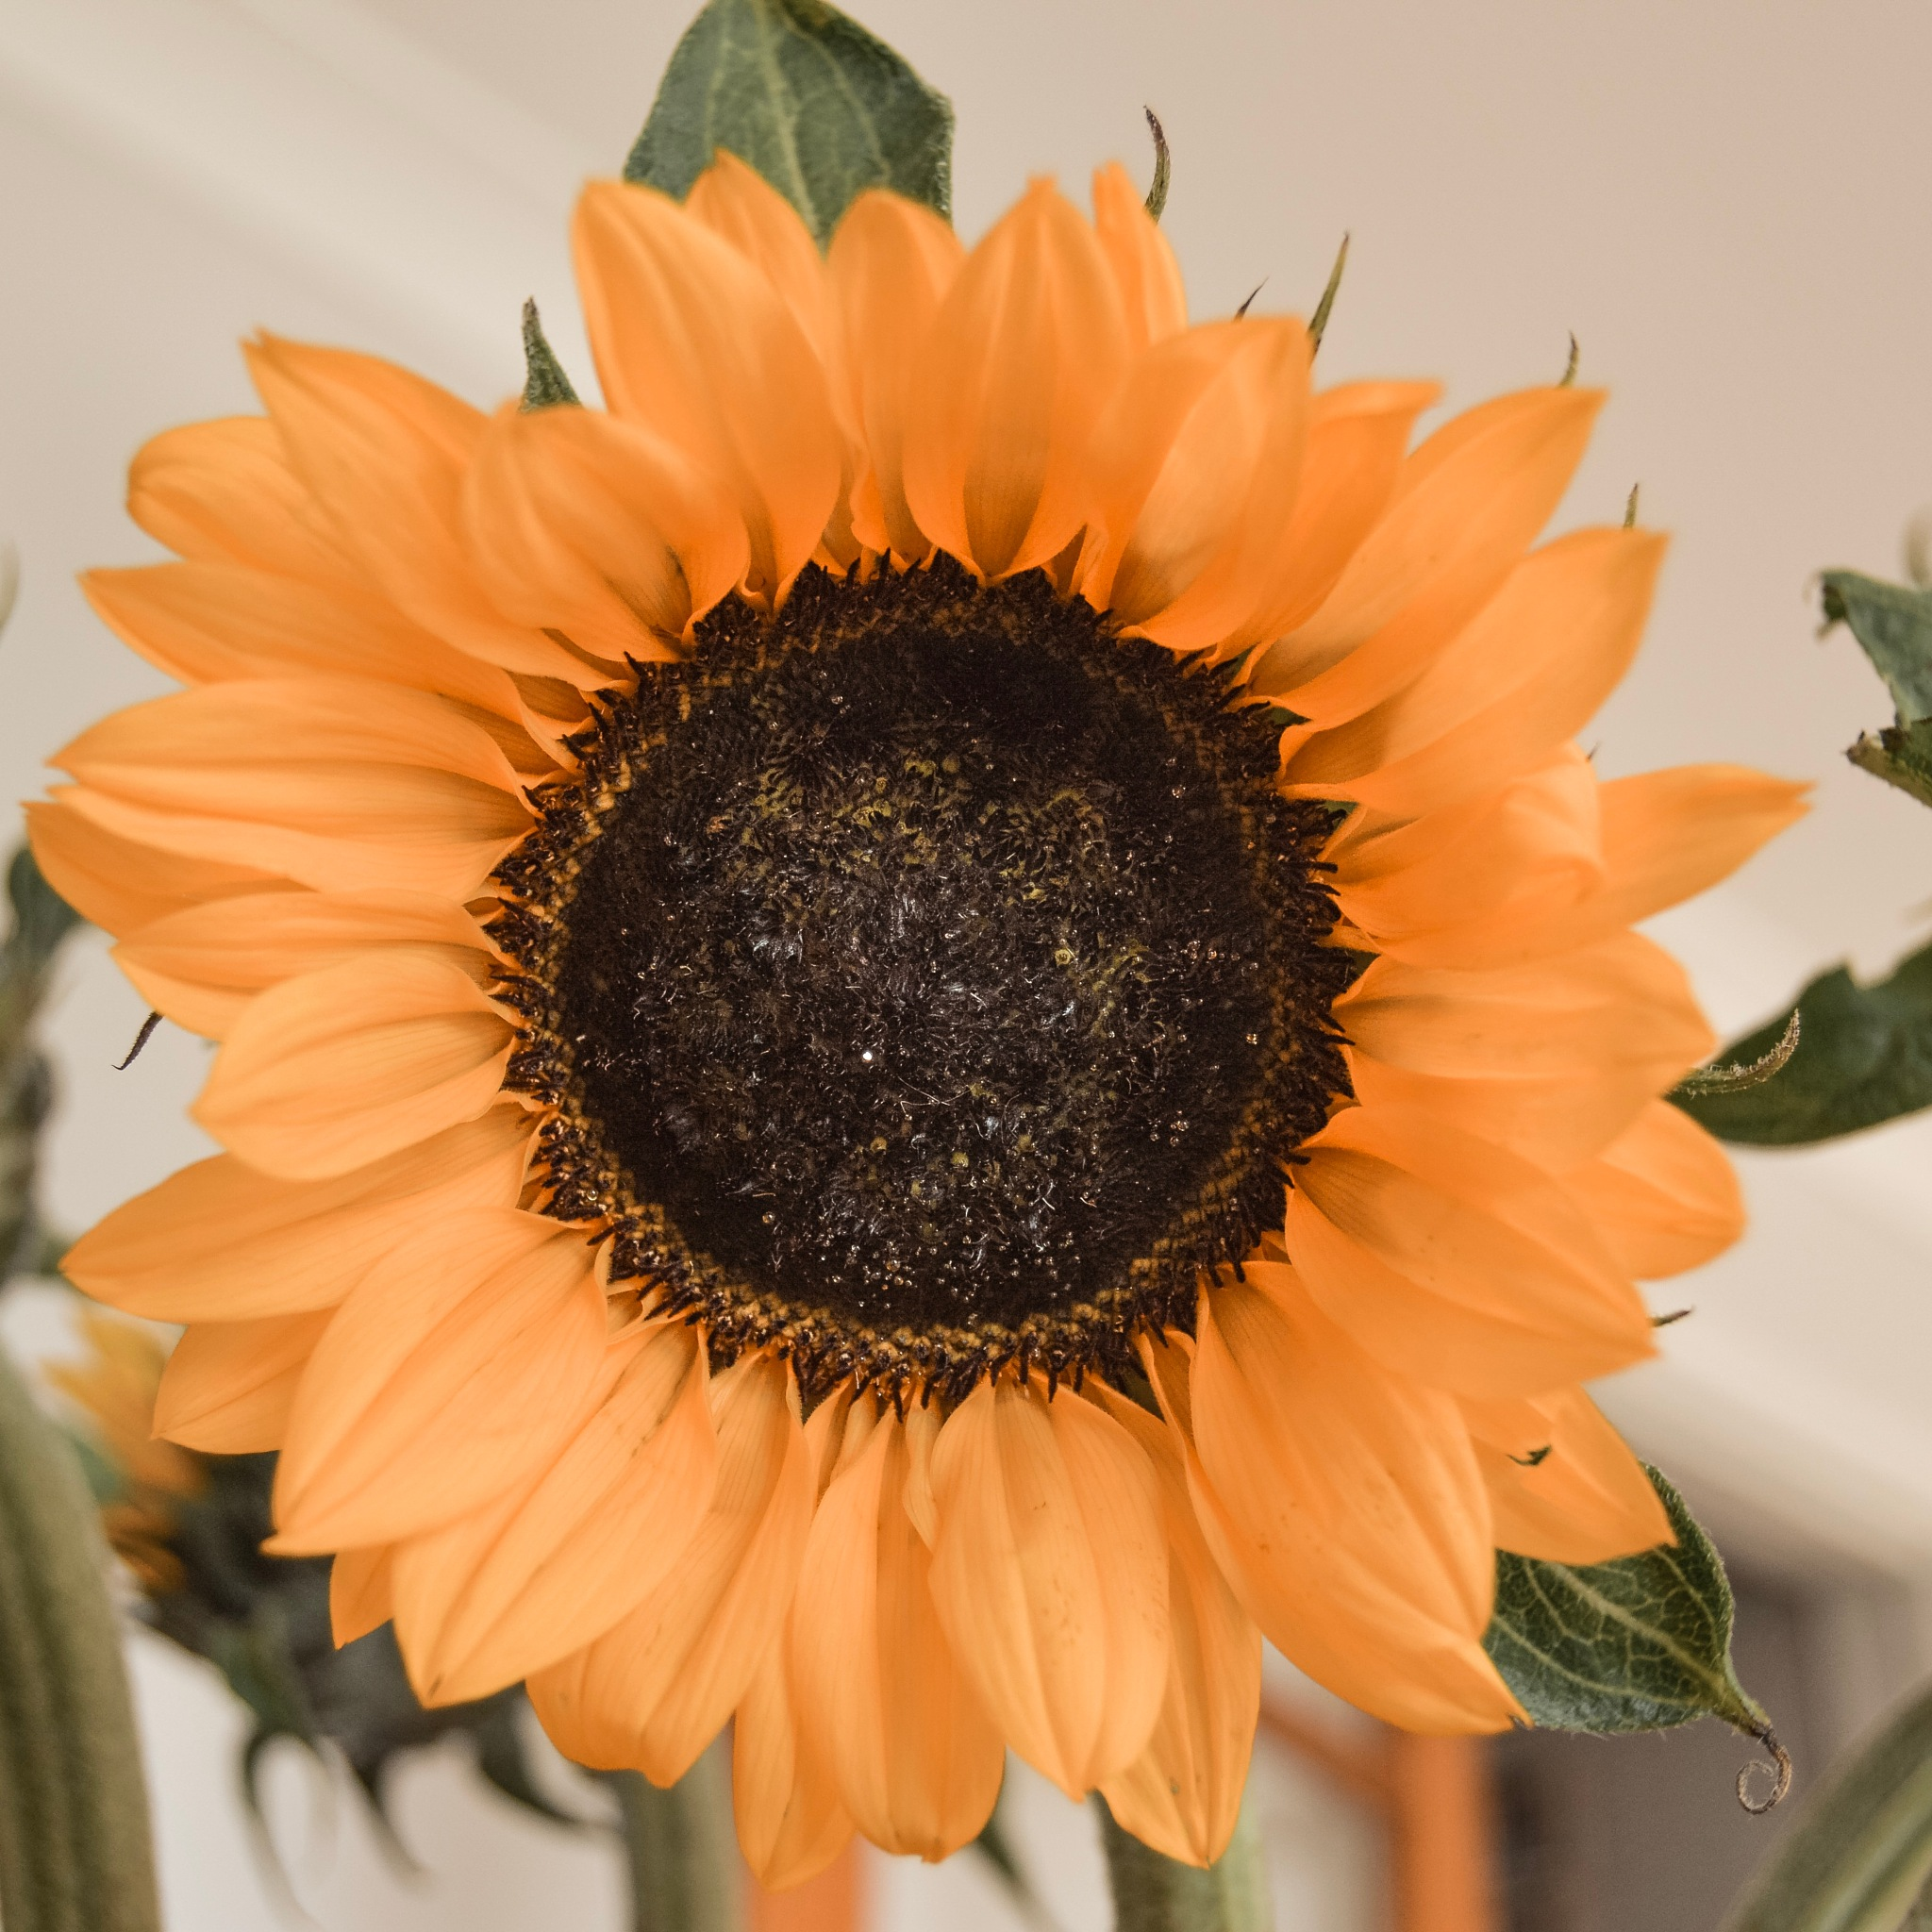 Sunflower by ashleighhiggins